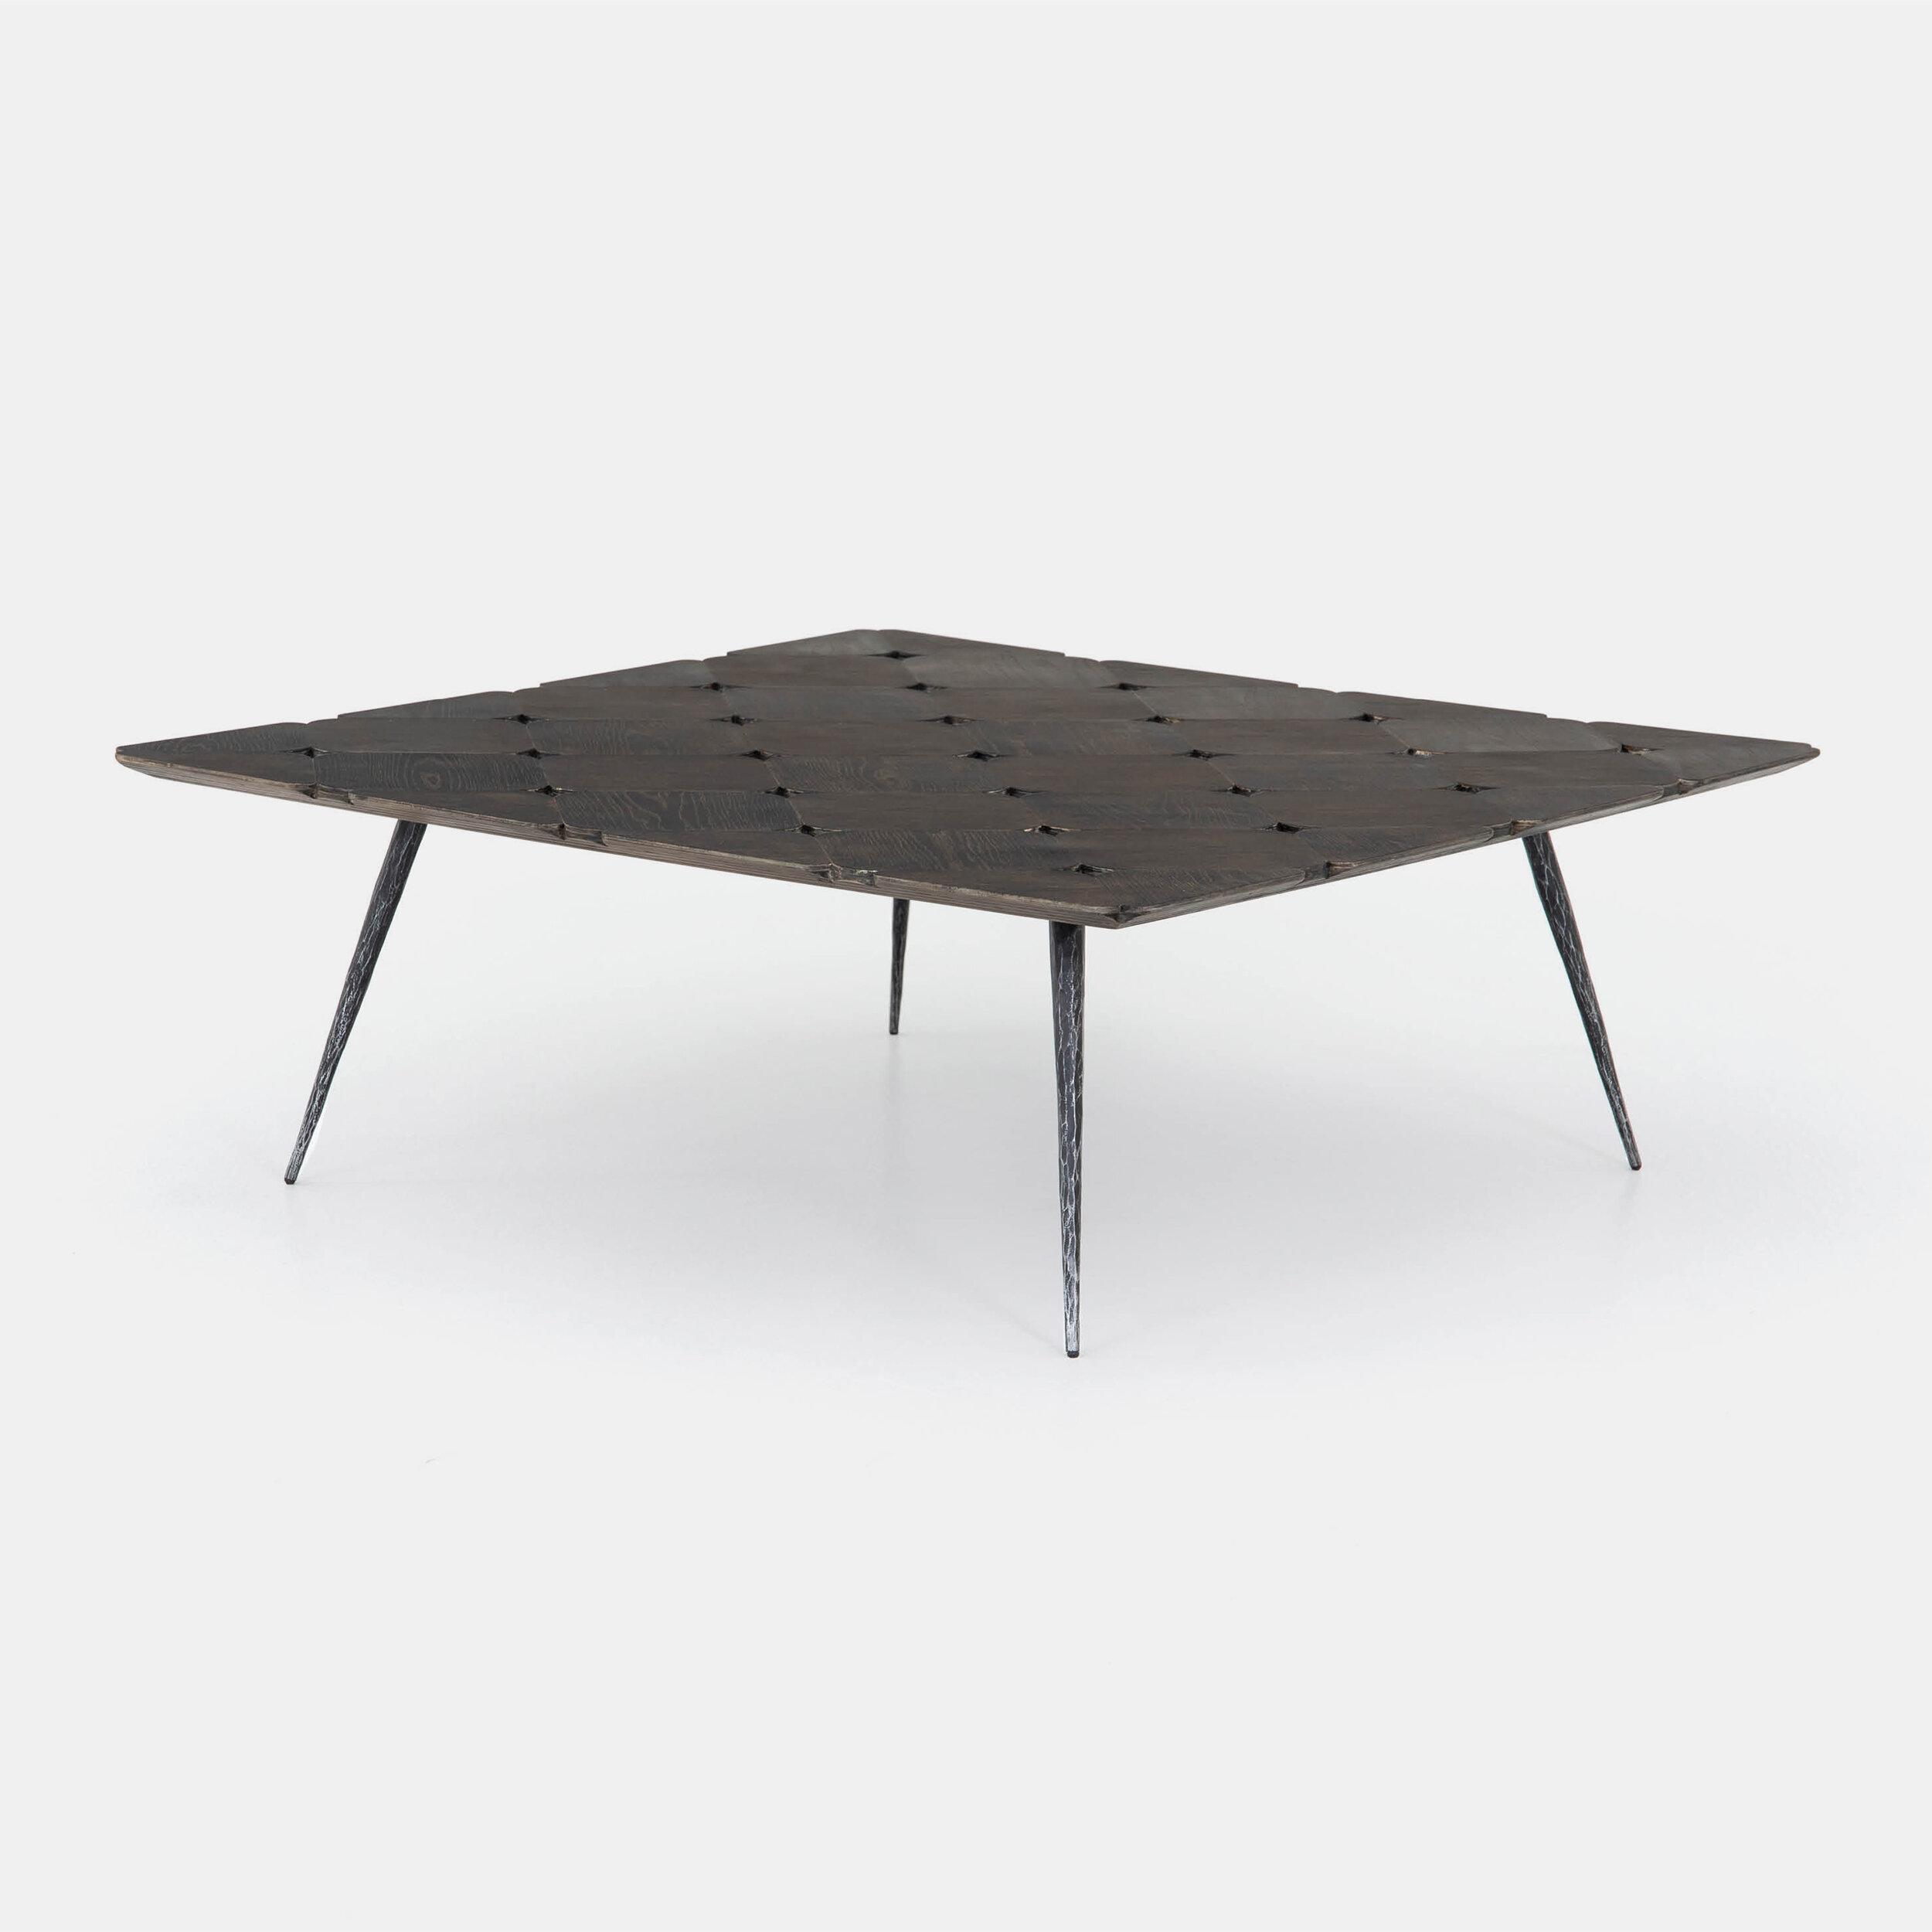 shop-mayker-home-gifting-design-nashville-hargrove-coffee-table.jpg